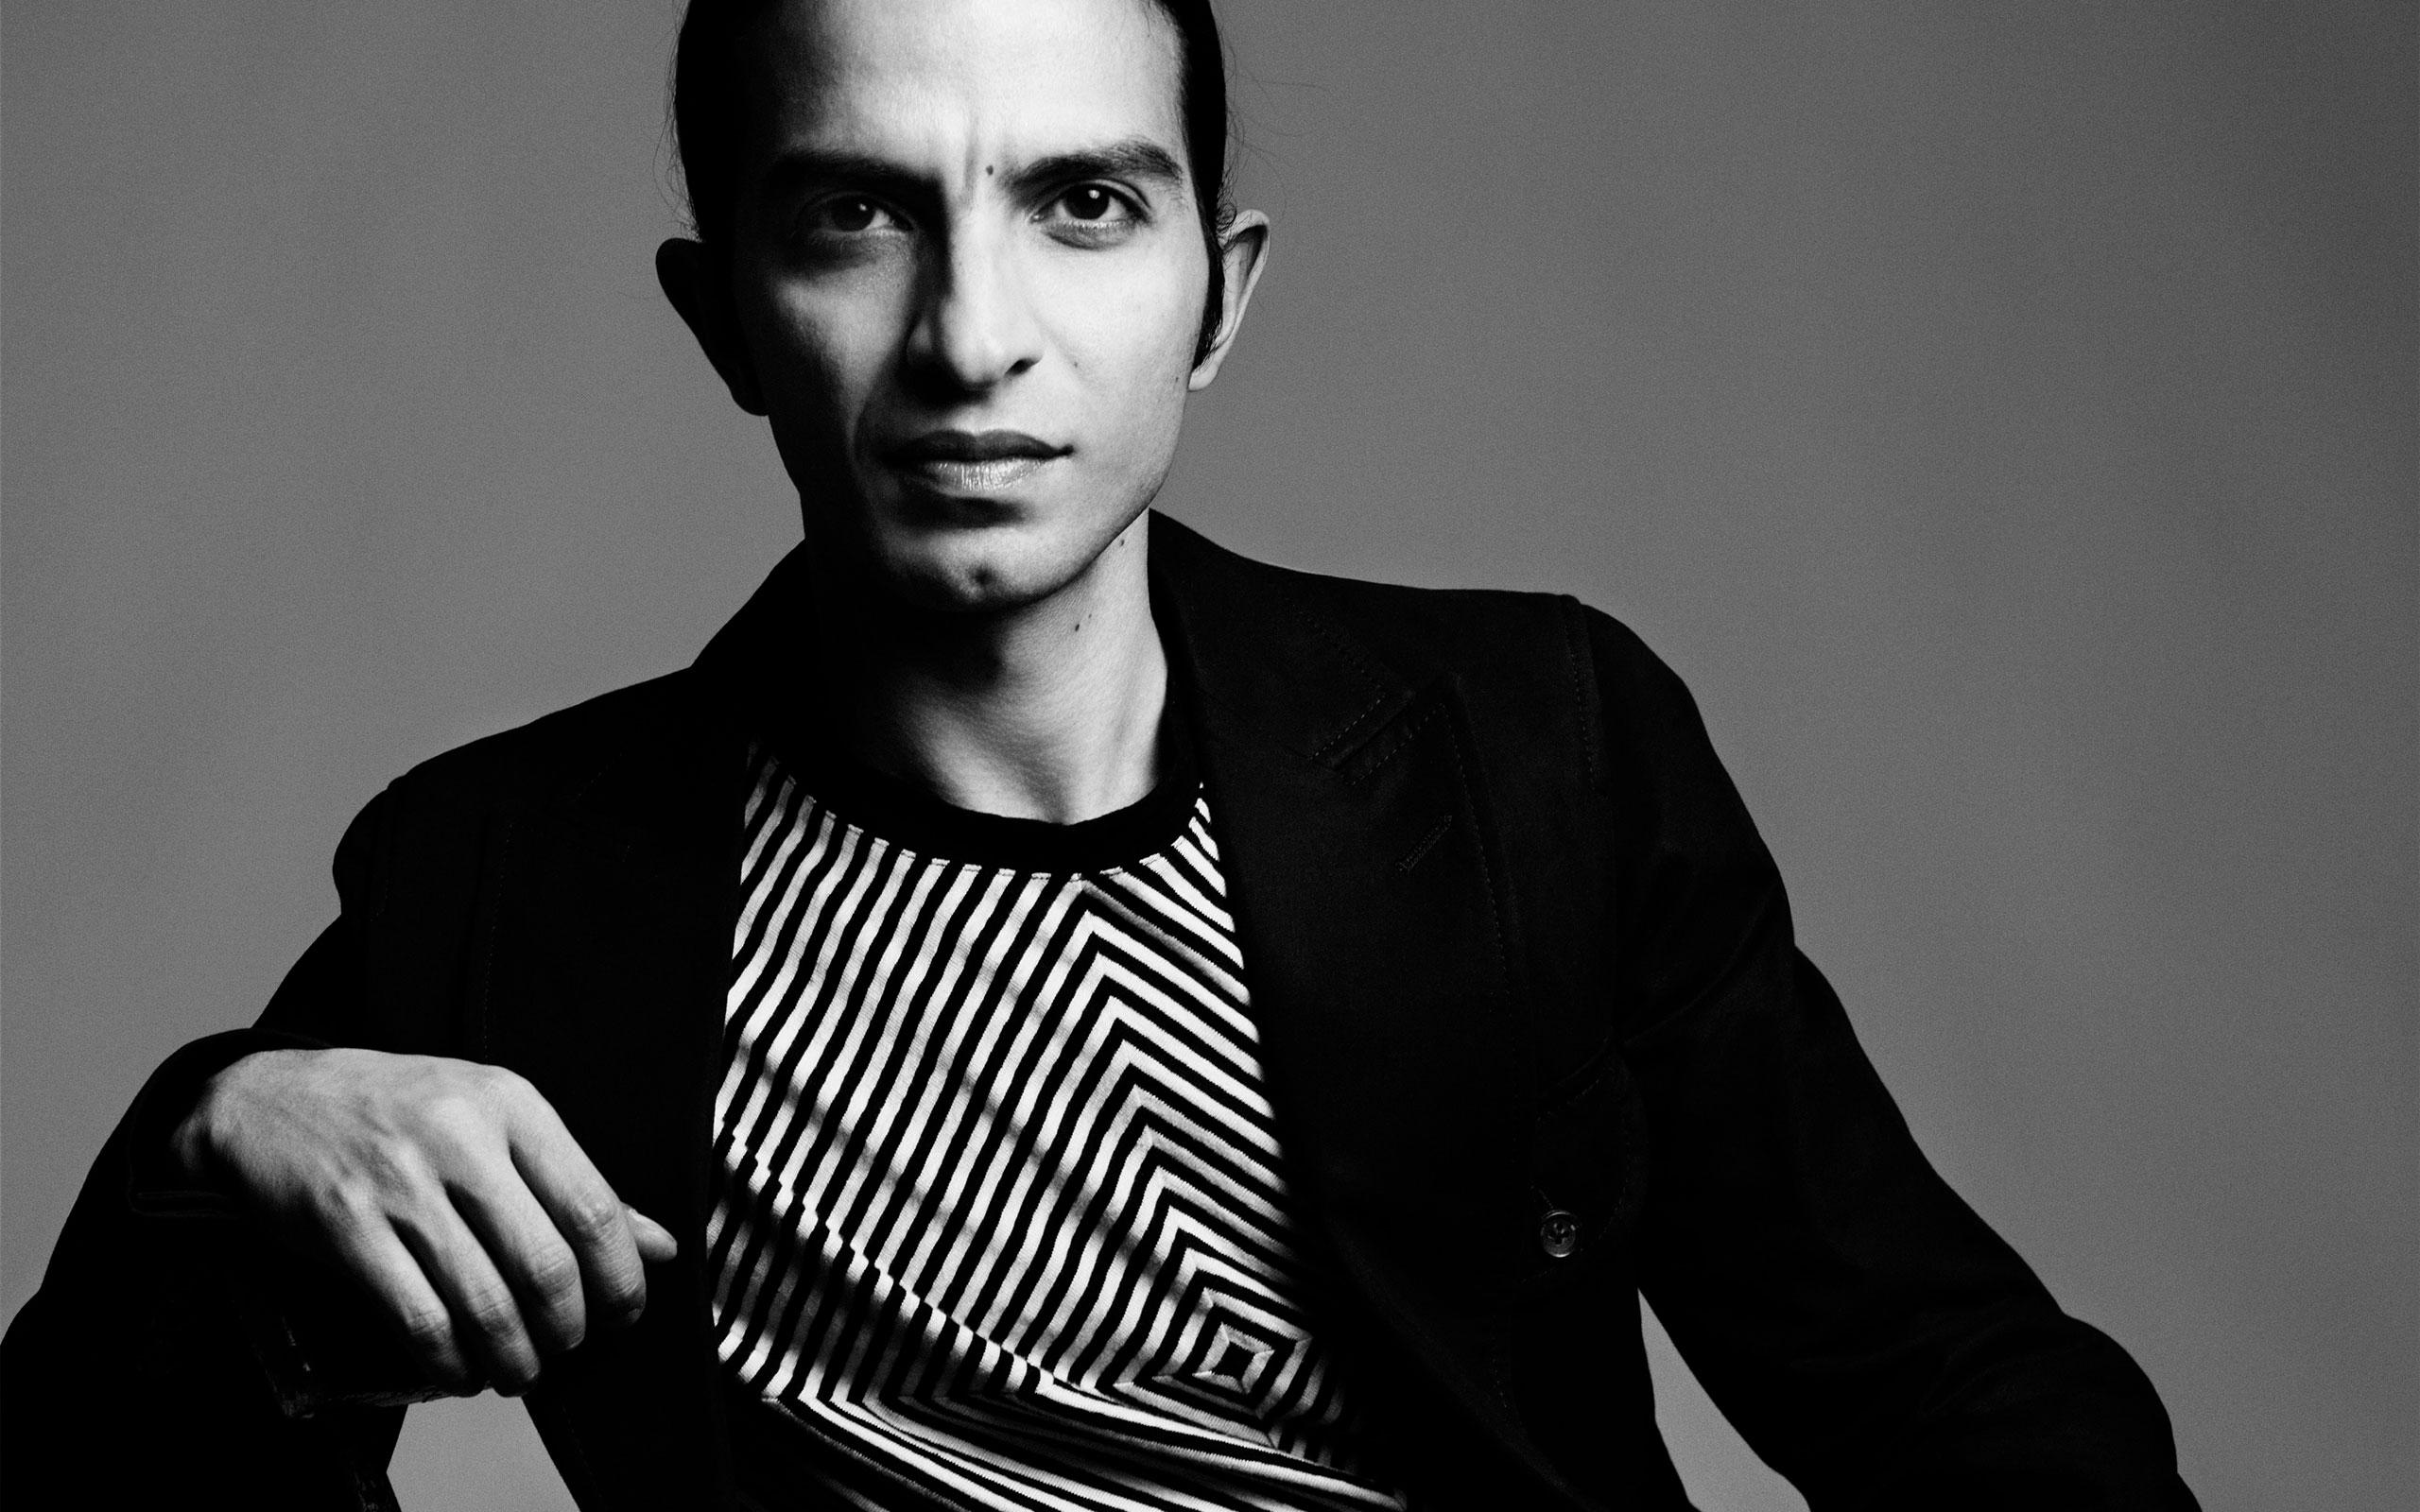 『The Business of Fashion』編集長 Imran Amed (イムラン・アーメド) インタビュー